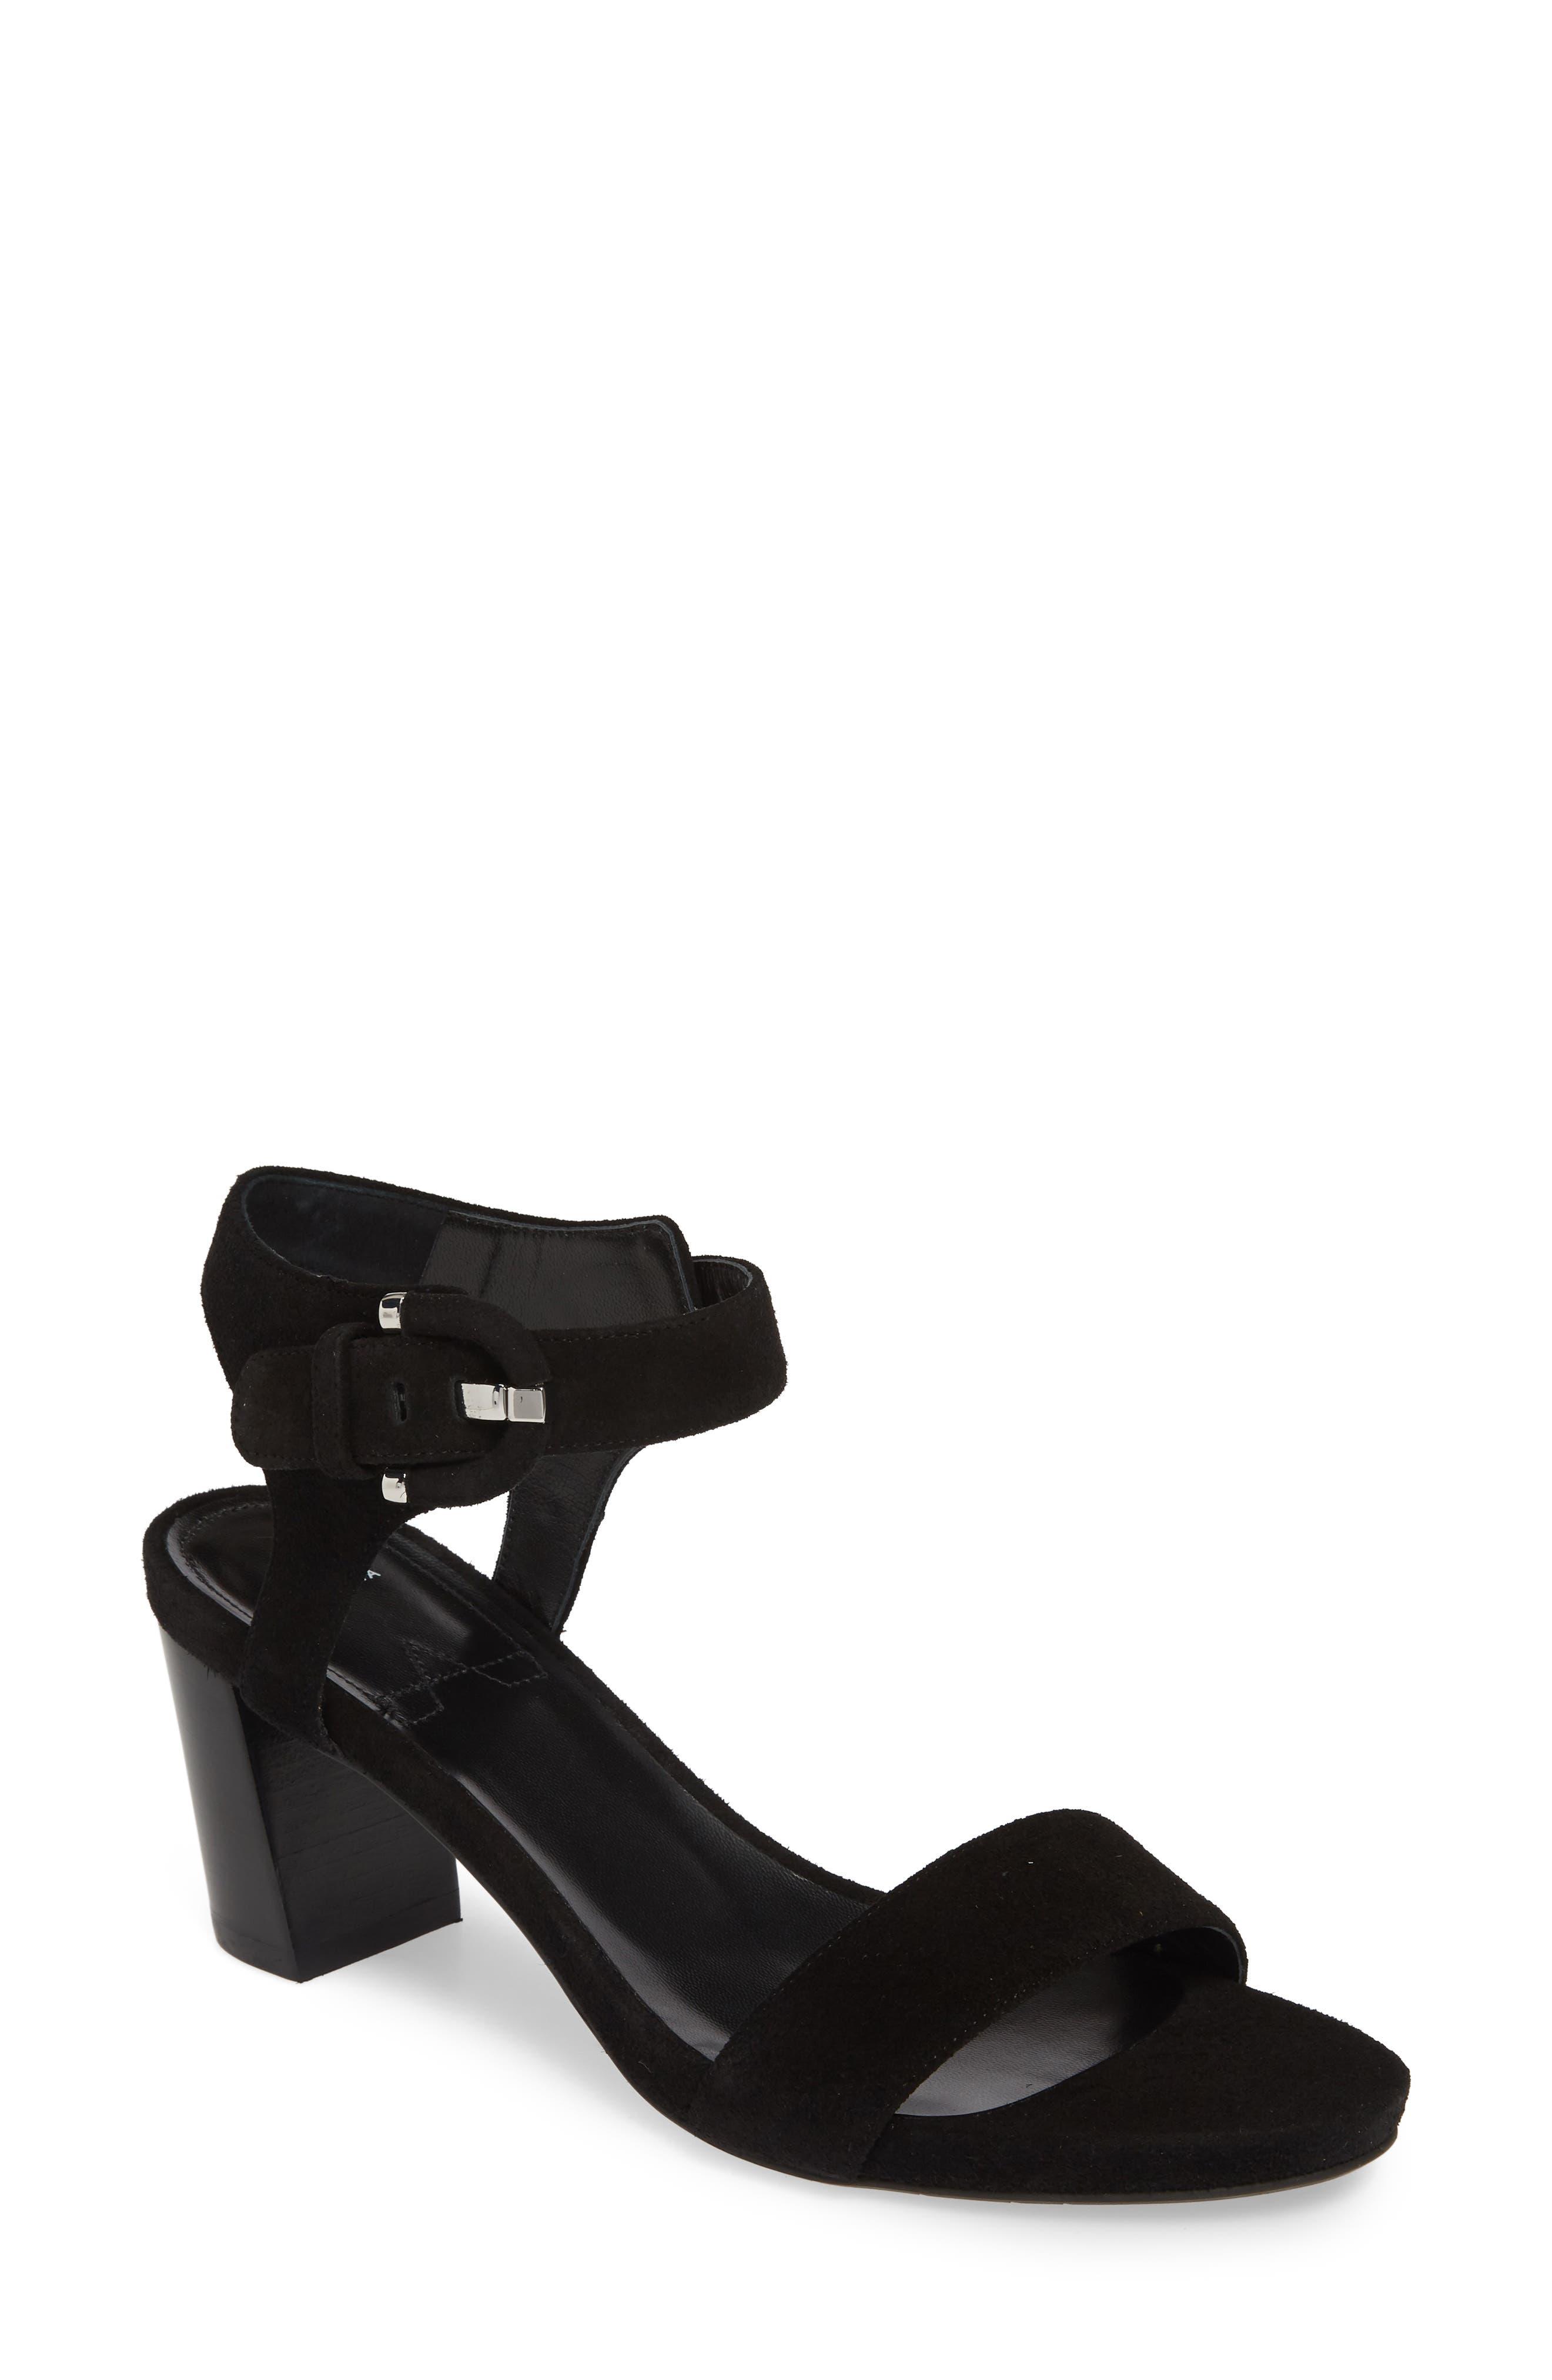 Aquatalia Breanna Ankle Strap Sandal- Black